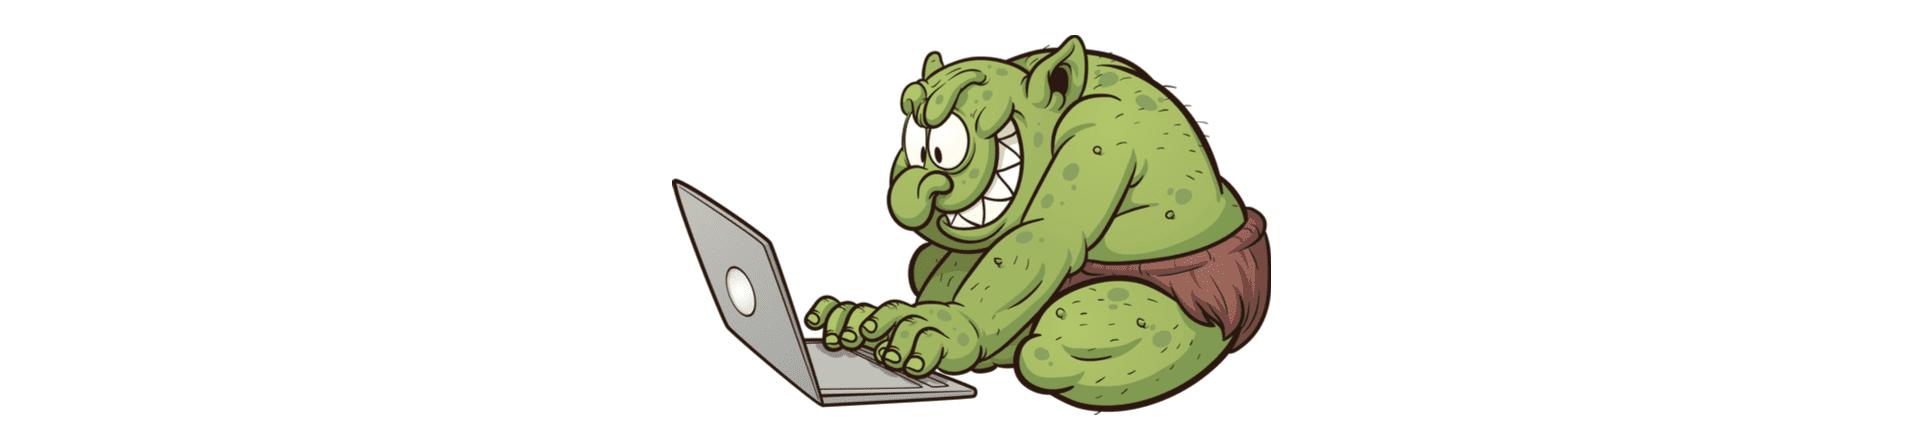 internet troll leaving bad patient reviews